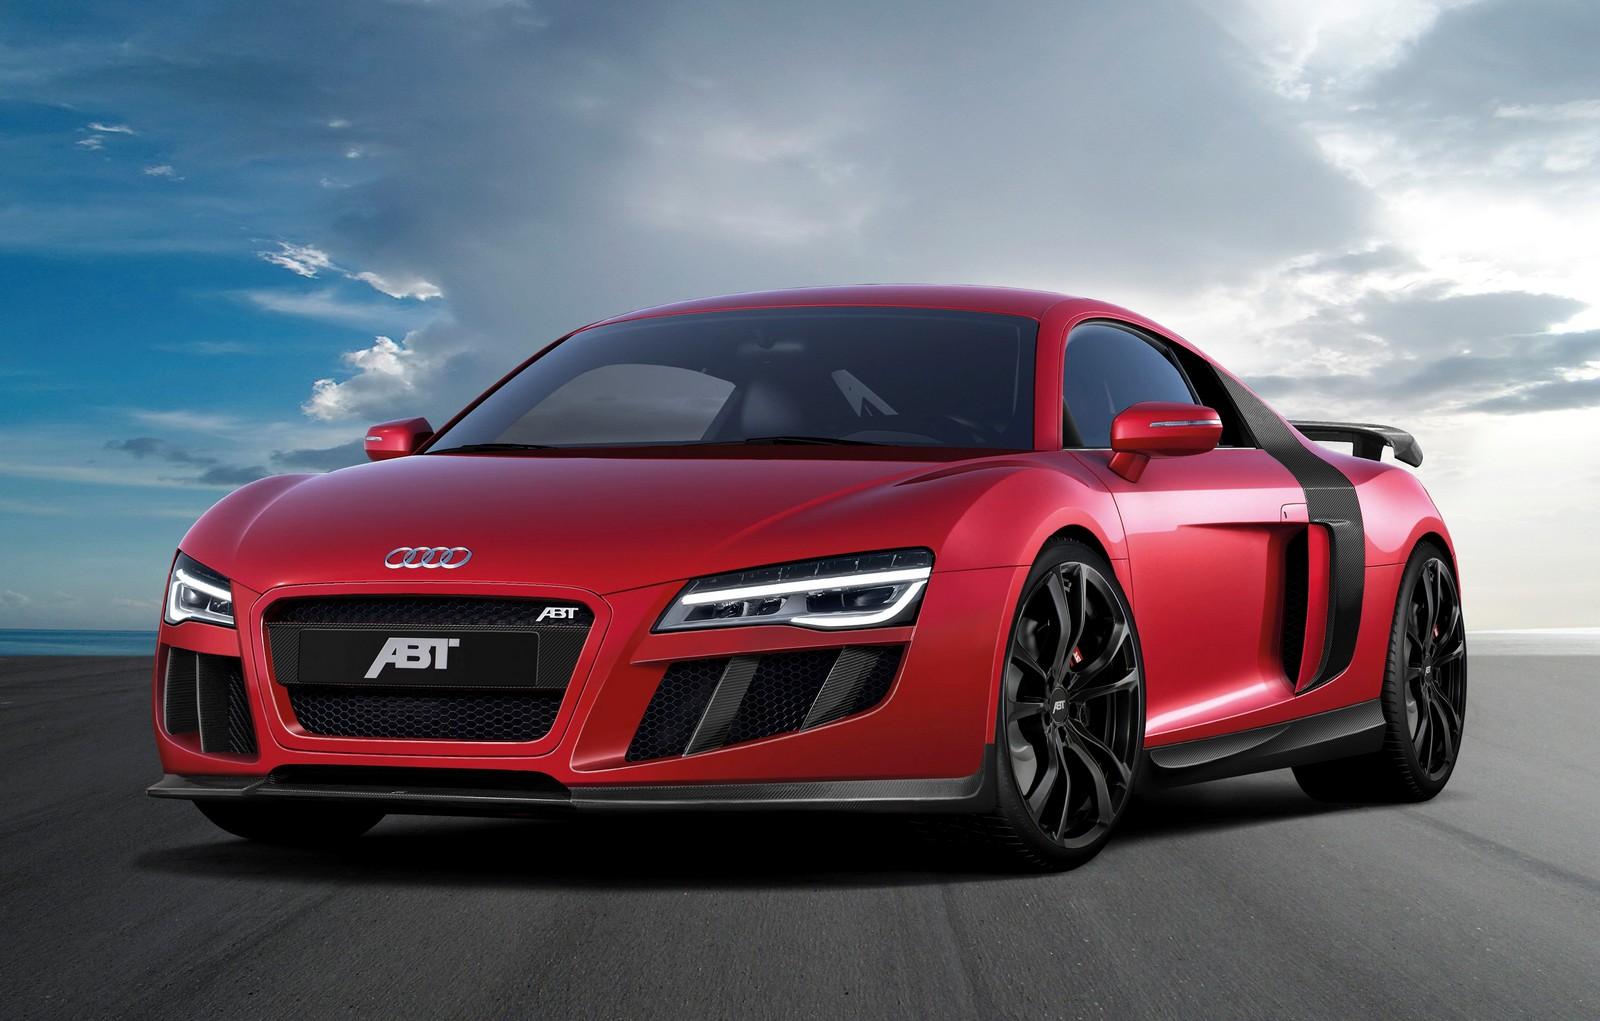 Official Abt Audi R8 V10 Gtspirit